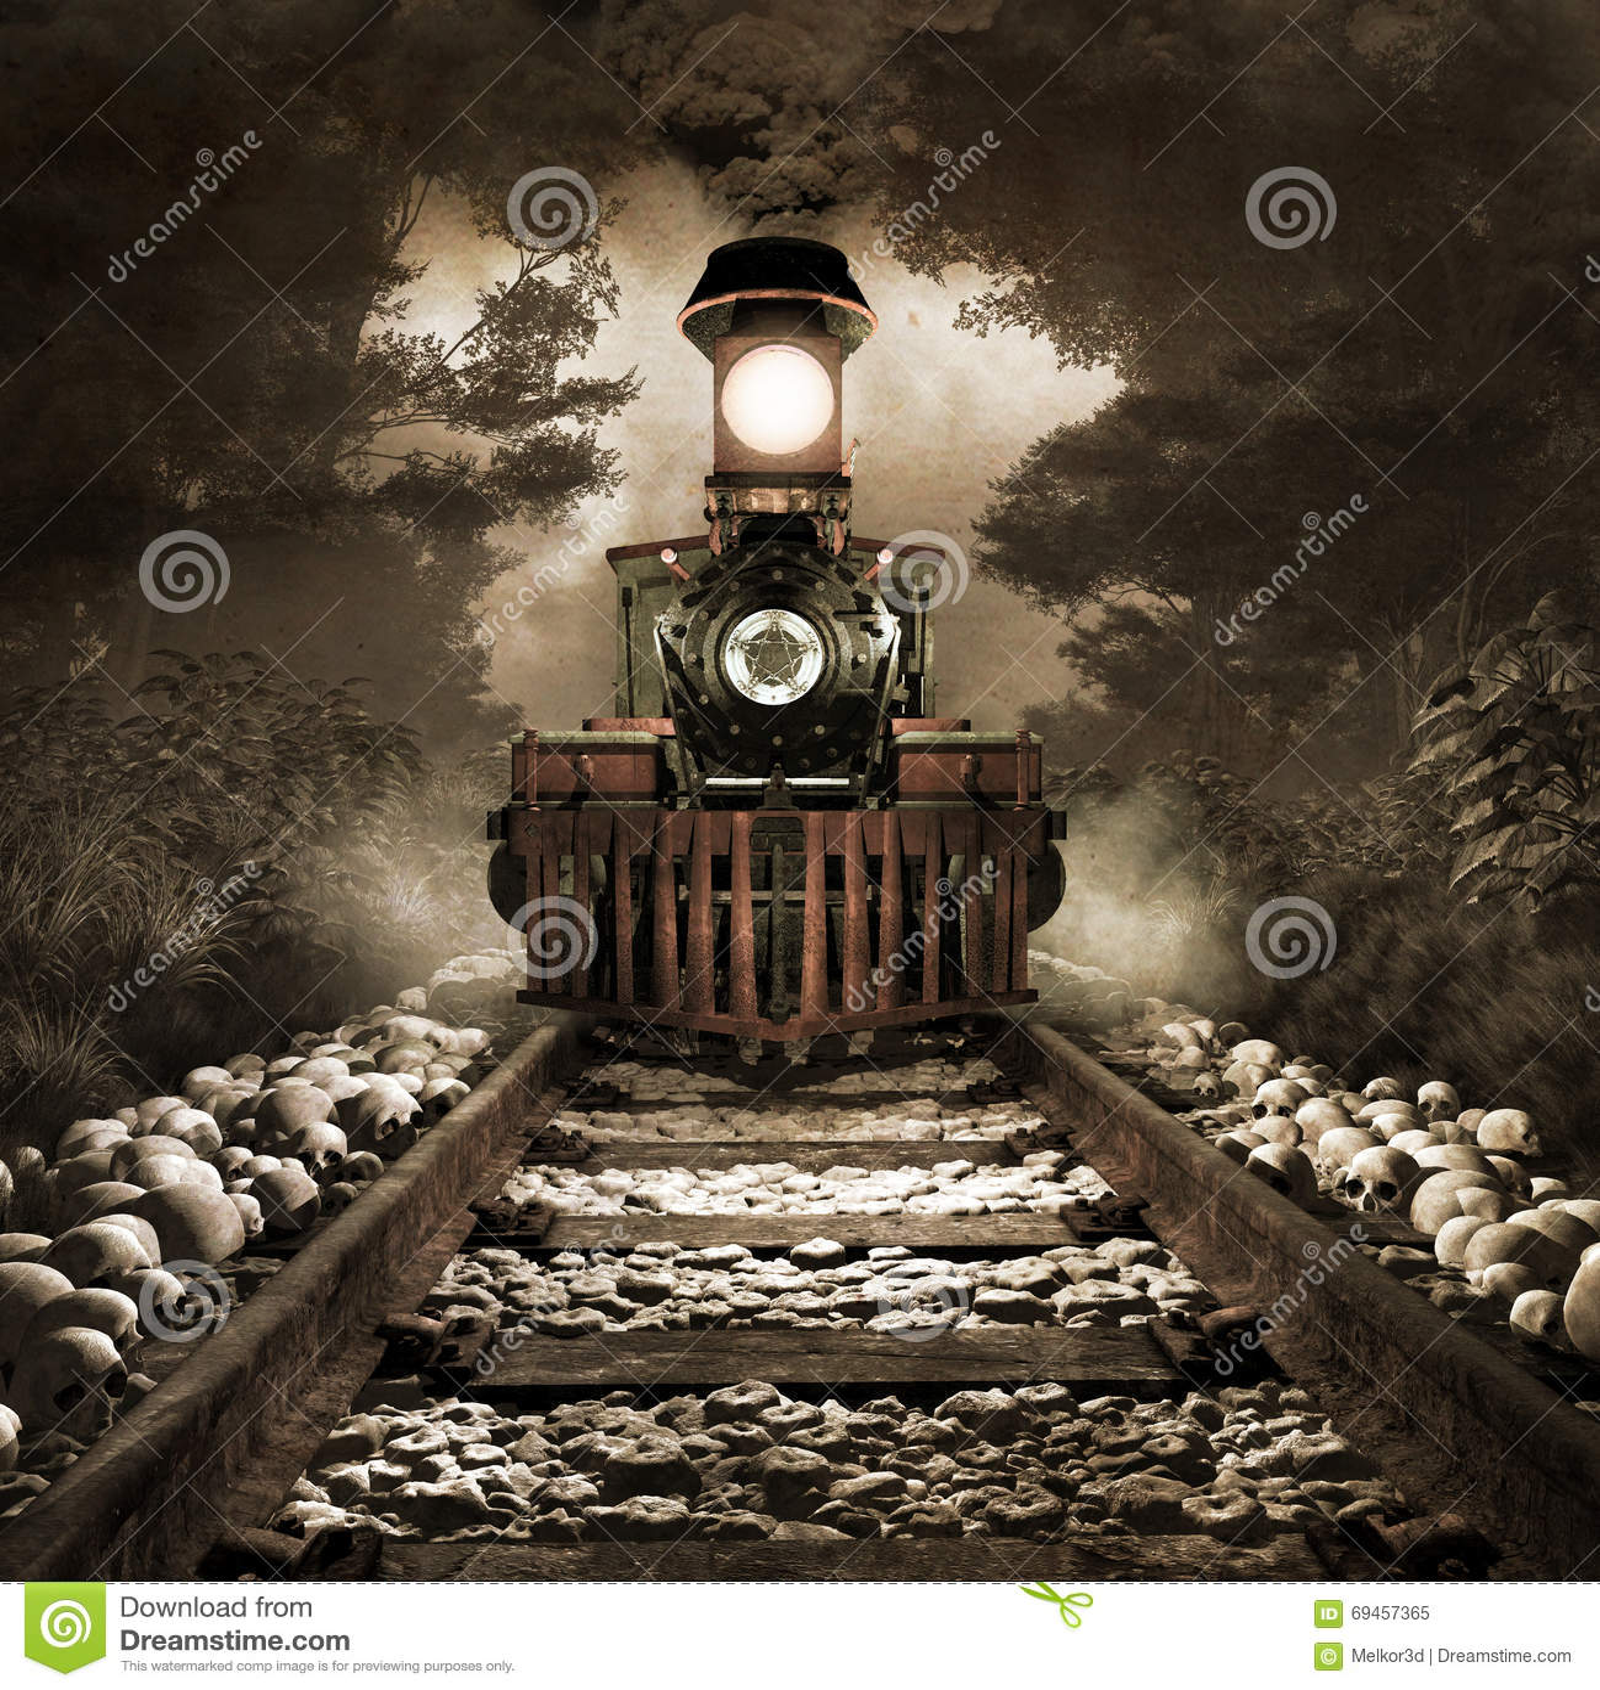 Tren asustadizo